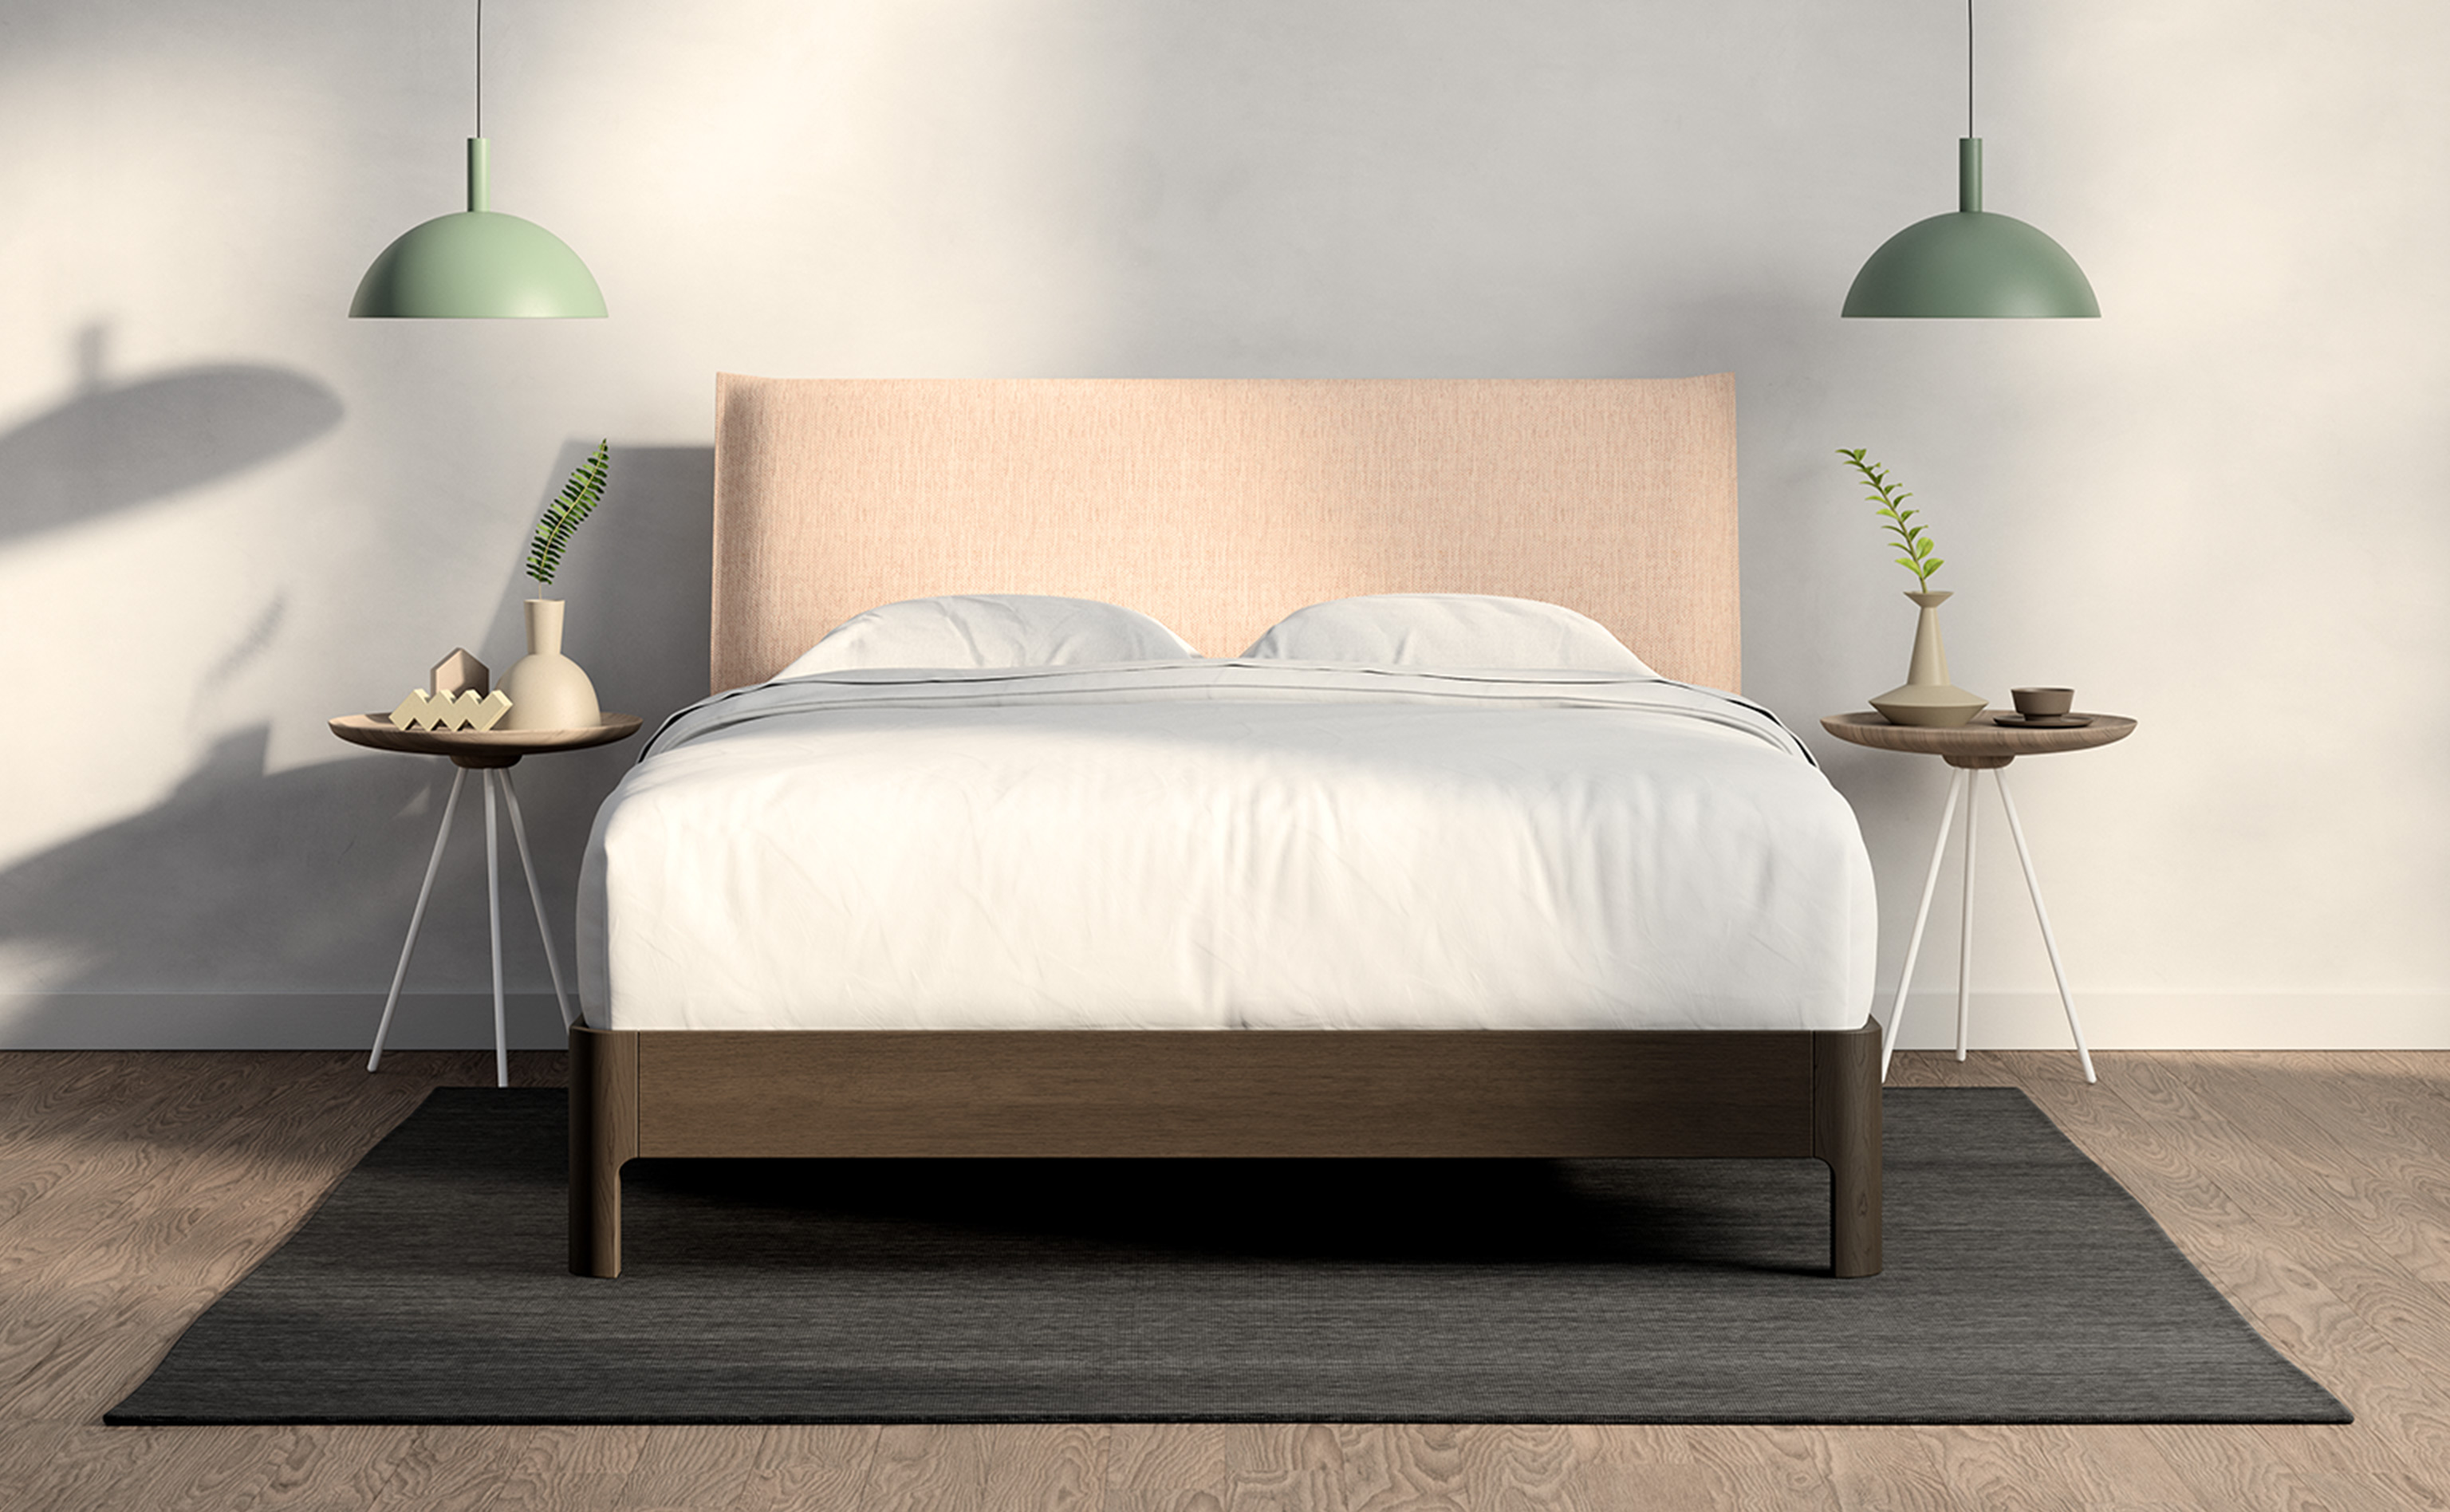 Casper Repose Wooden Bed Frame With Headbord Casper